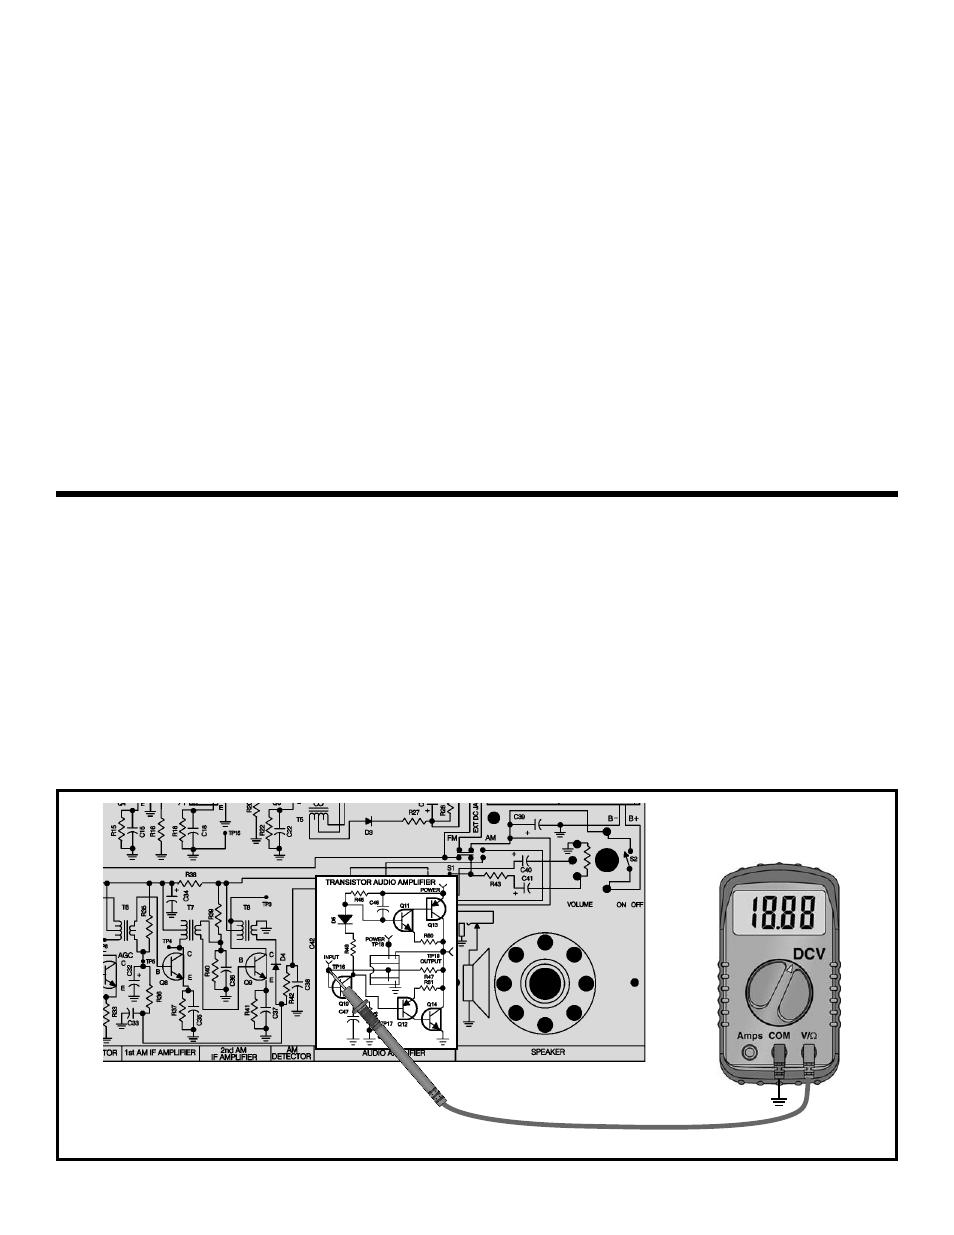 Dynamic measurements | Elenco AM/FM Radio Kit User Manual